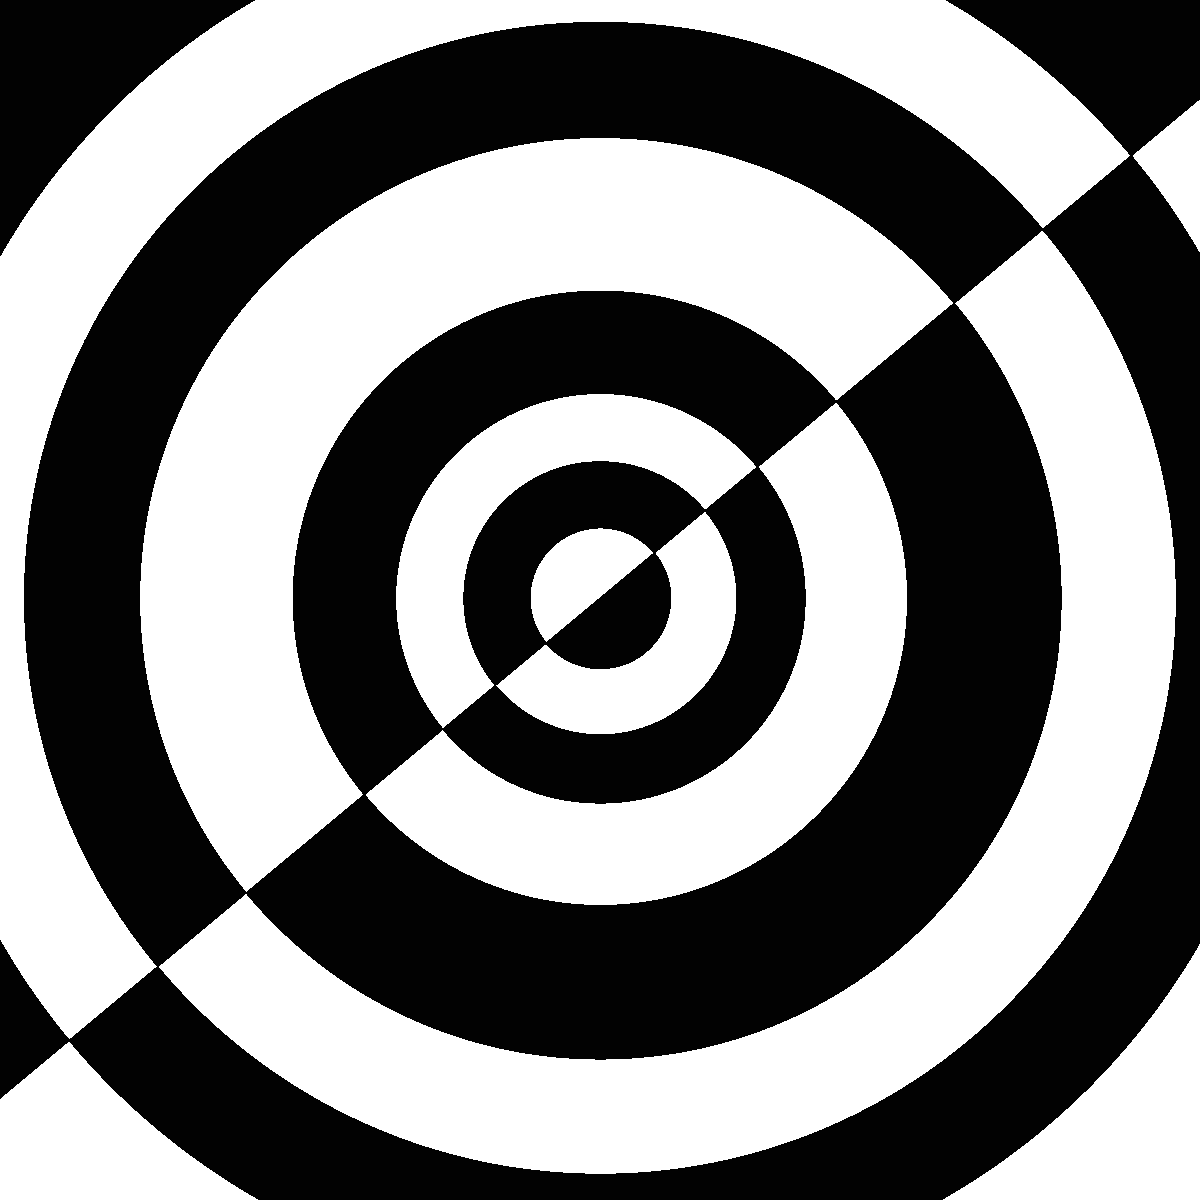 Stickers muraux design sticker mural illusion d 39 optique 6 ambiance - Illusion optique dessin ...